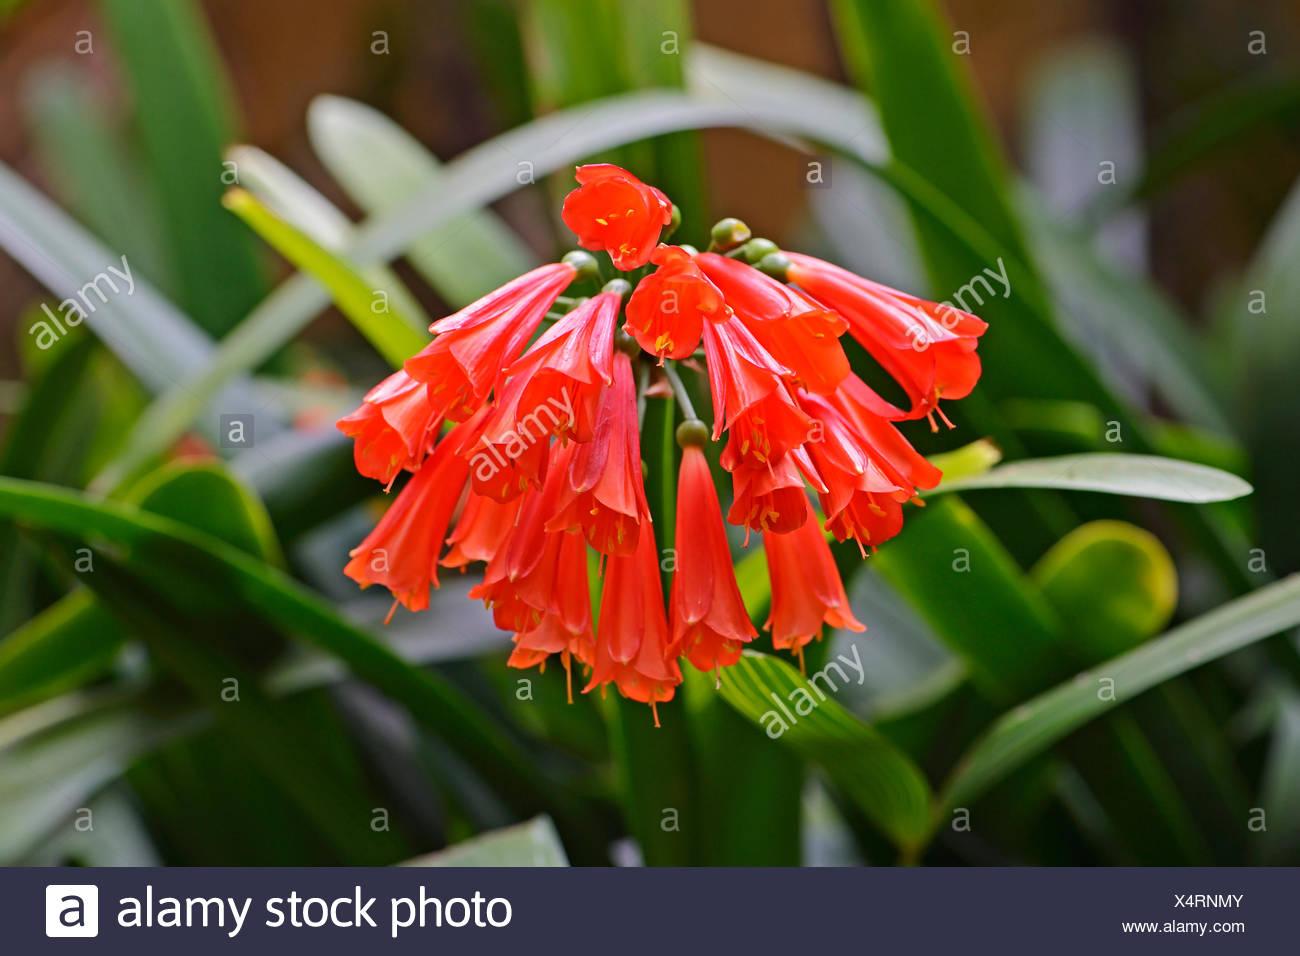 Klivie (Clivia caulescens), Suedafrika - Stock Image